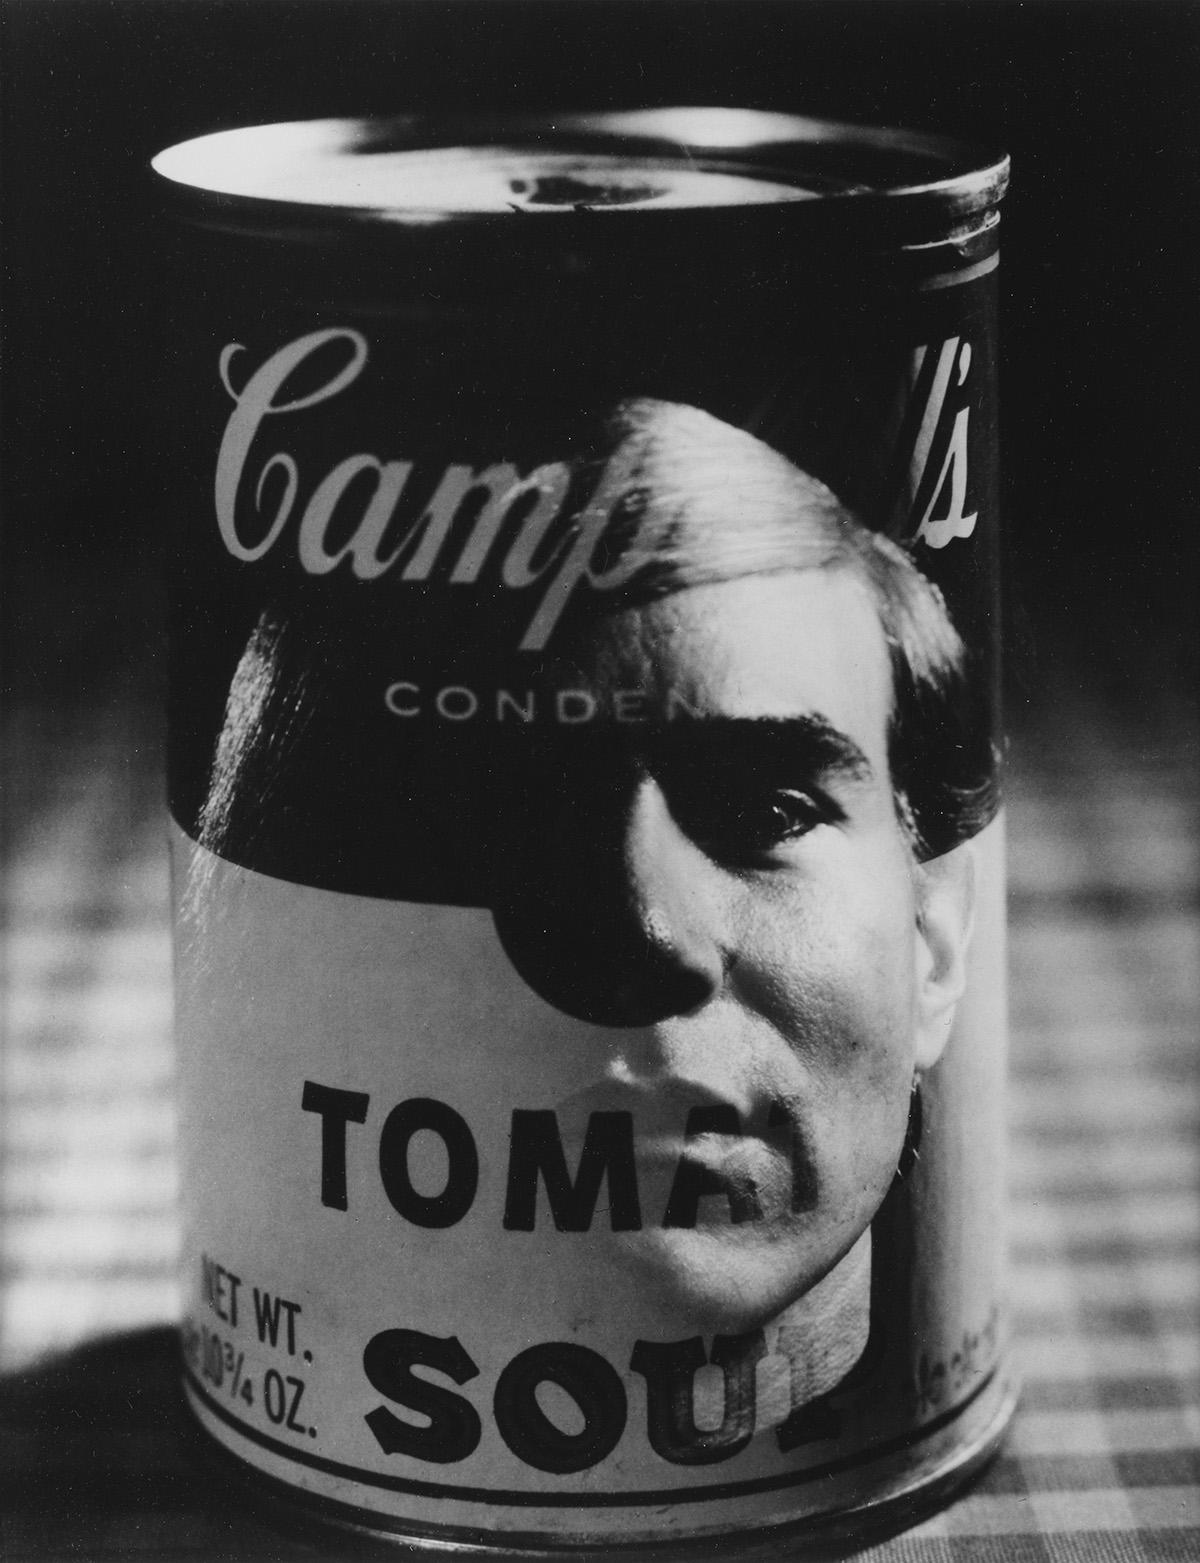 PHILLIPE HALSMAN (1906-1979) Andy Warhol.